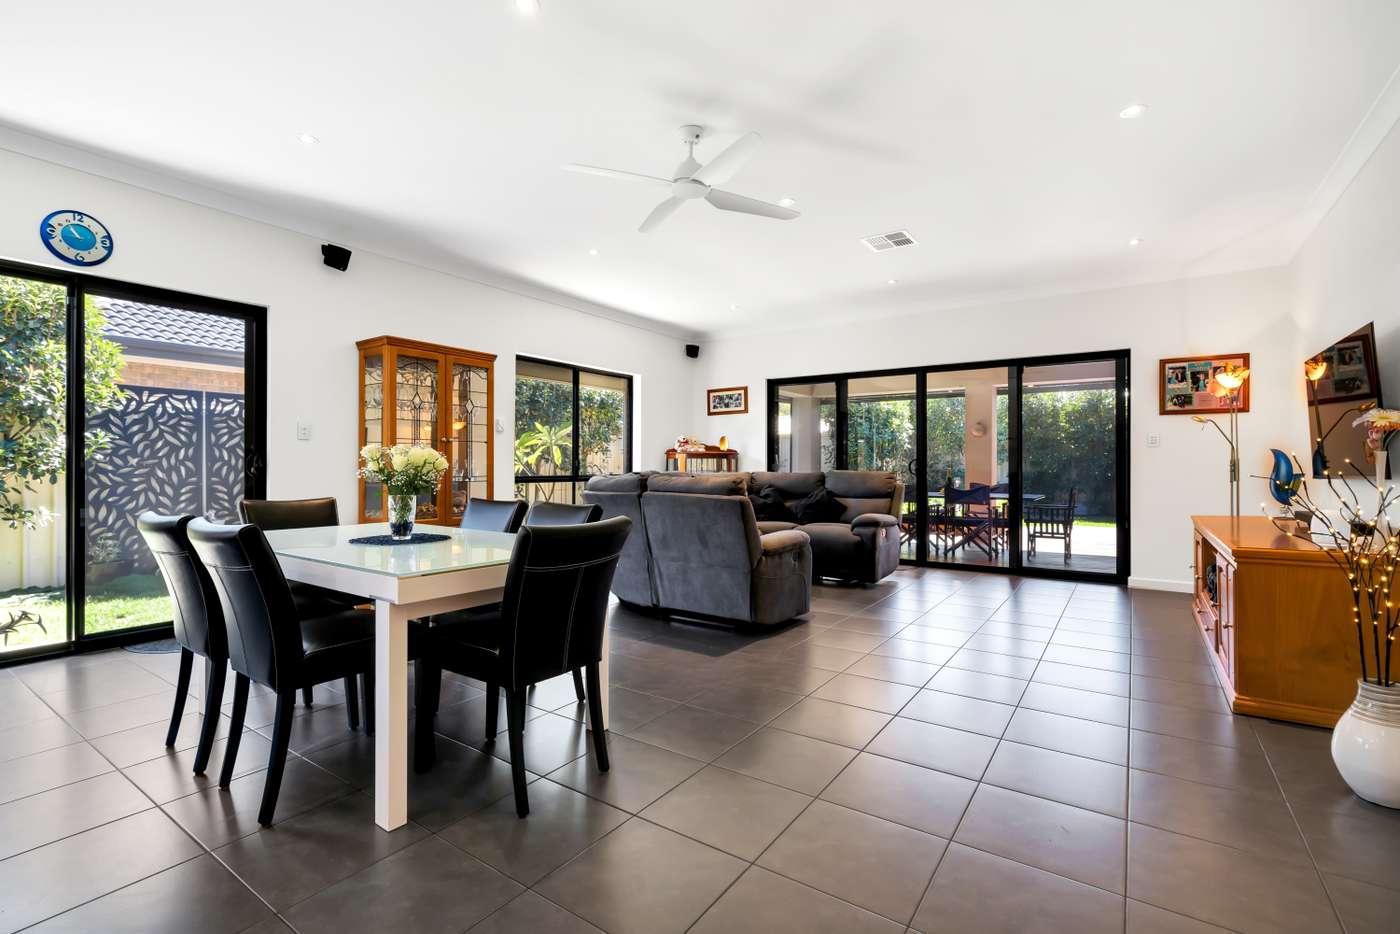 Sixth view of Homely house listing, 14 Gordon Terrace, Morphettville SA 5043